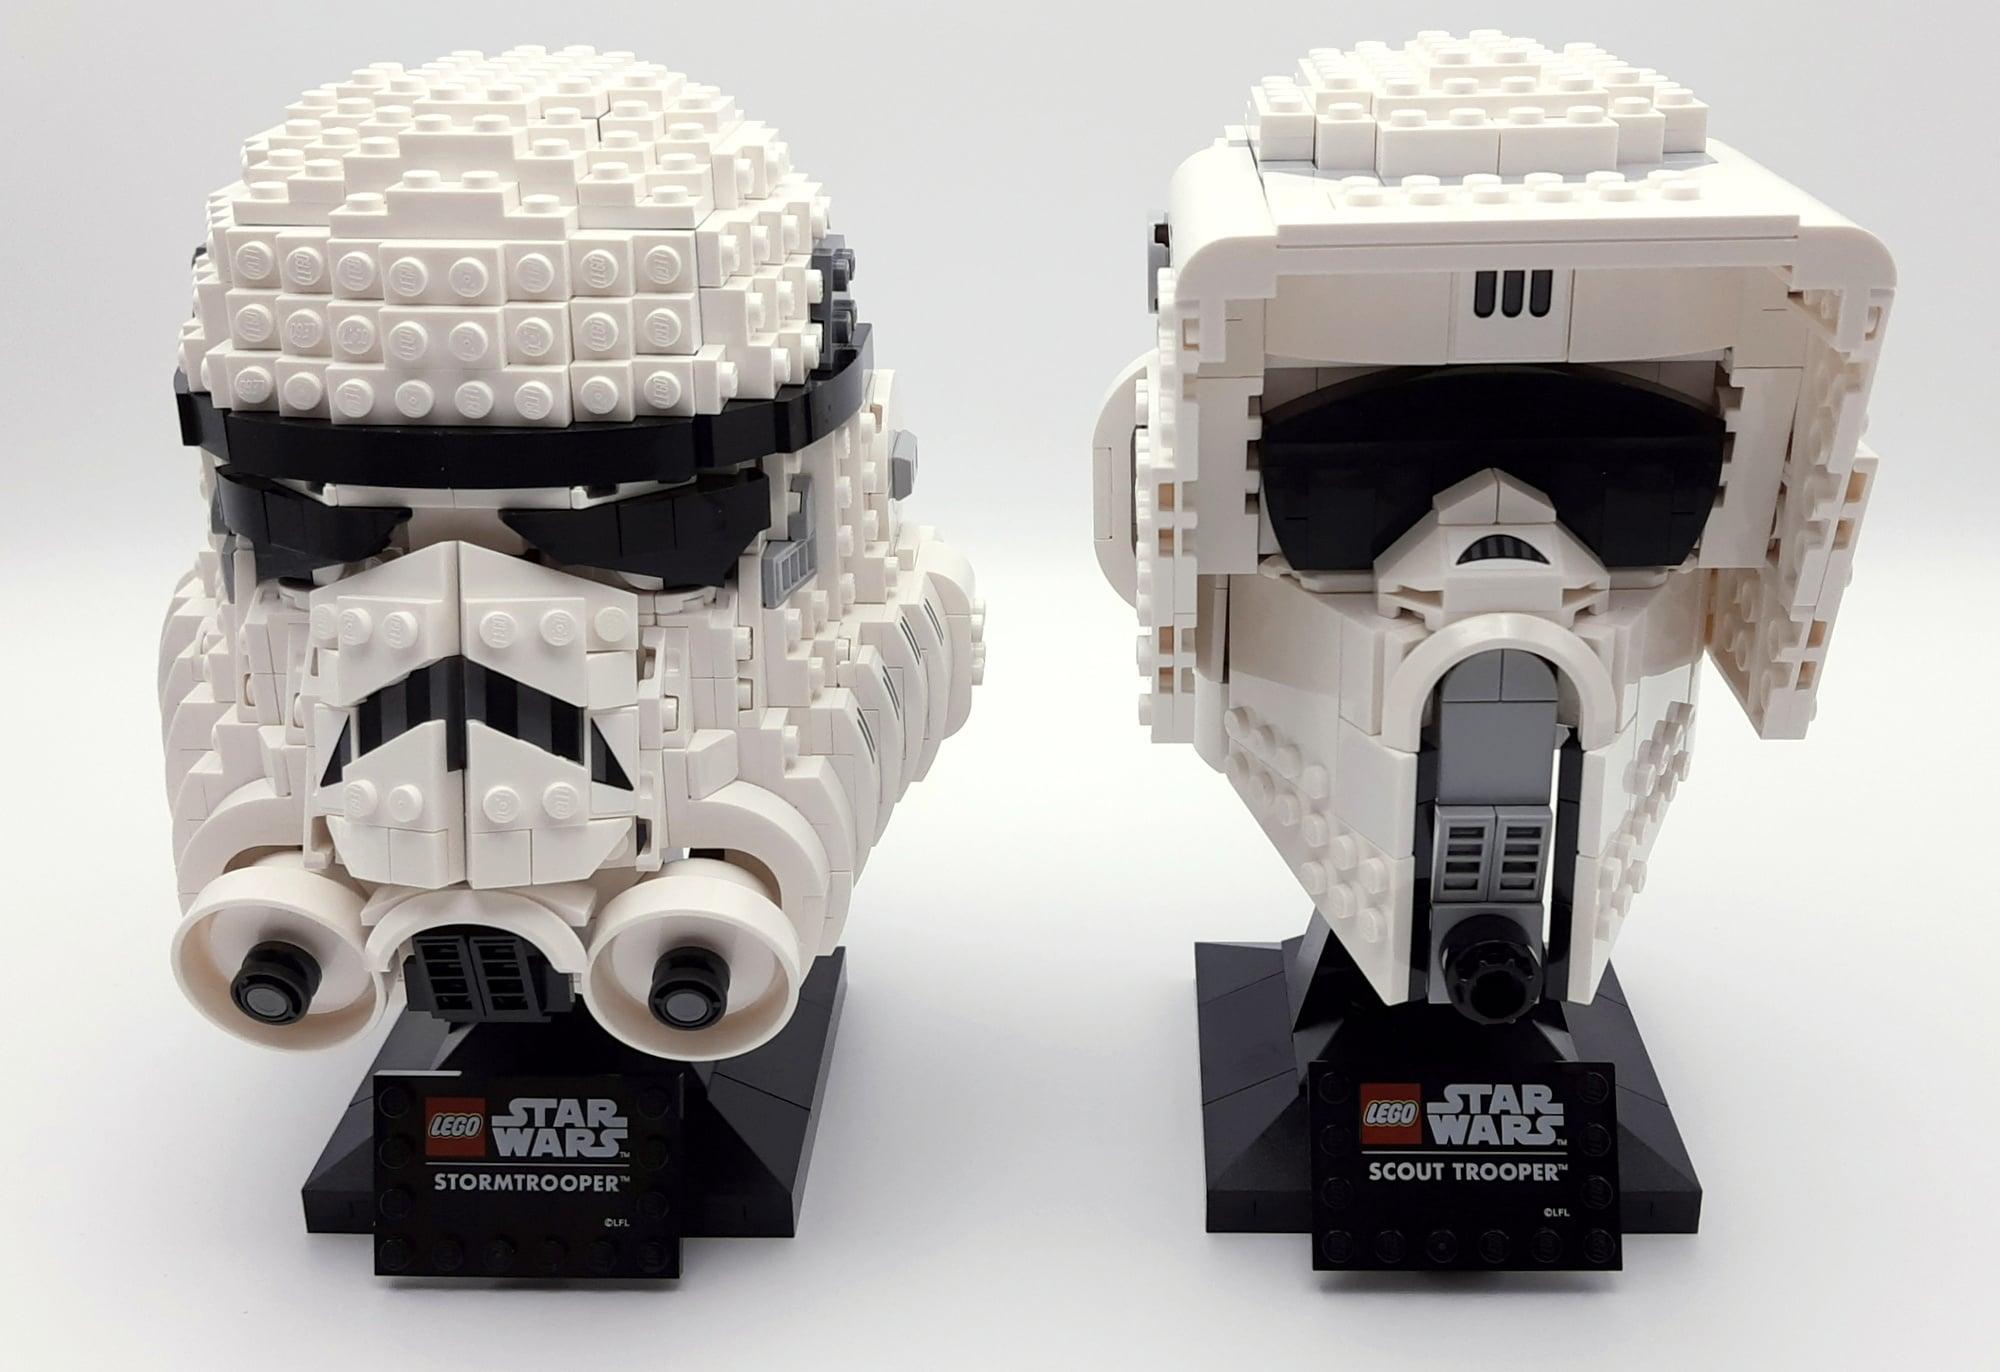 LEGO 75305 Scout Trooper Helm Vergleich Stormtrooper